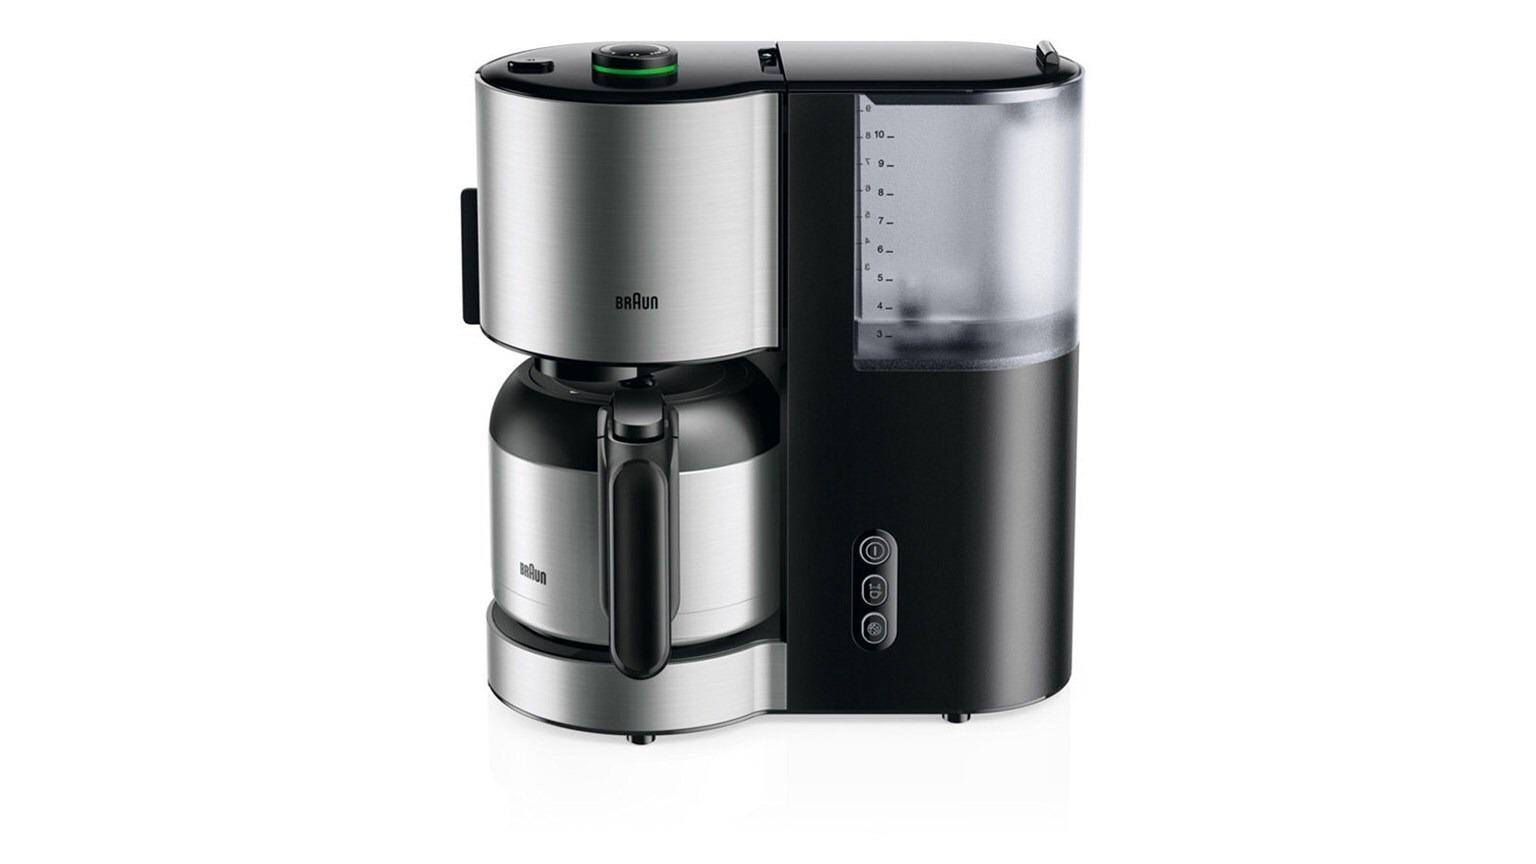 Braun KF5105 BK koffiefilter apparaat